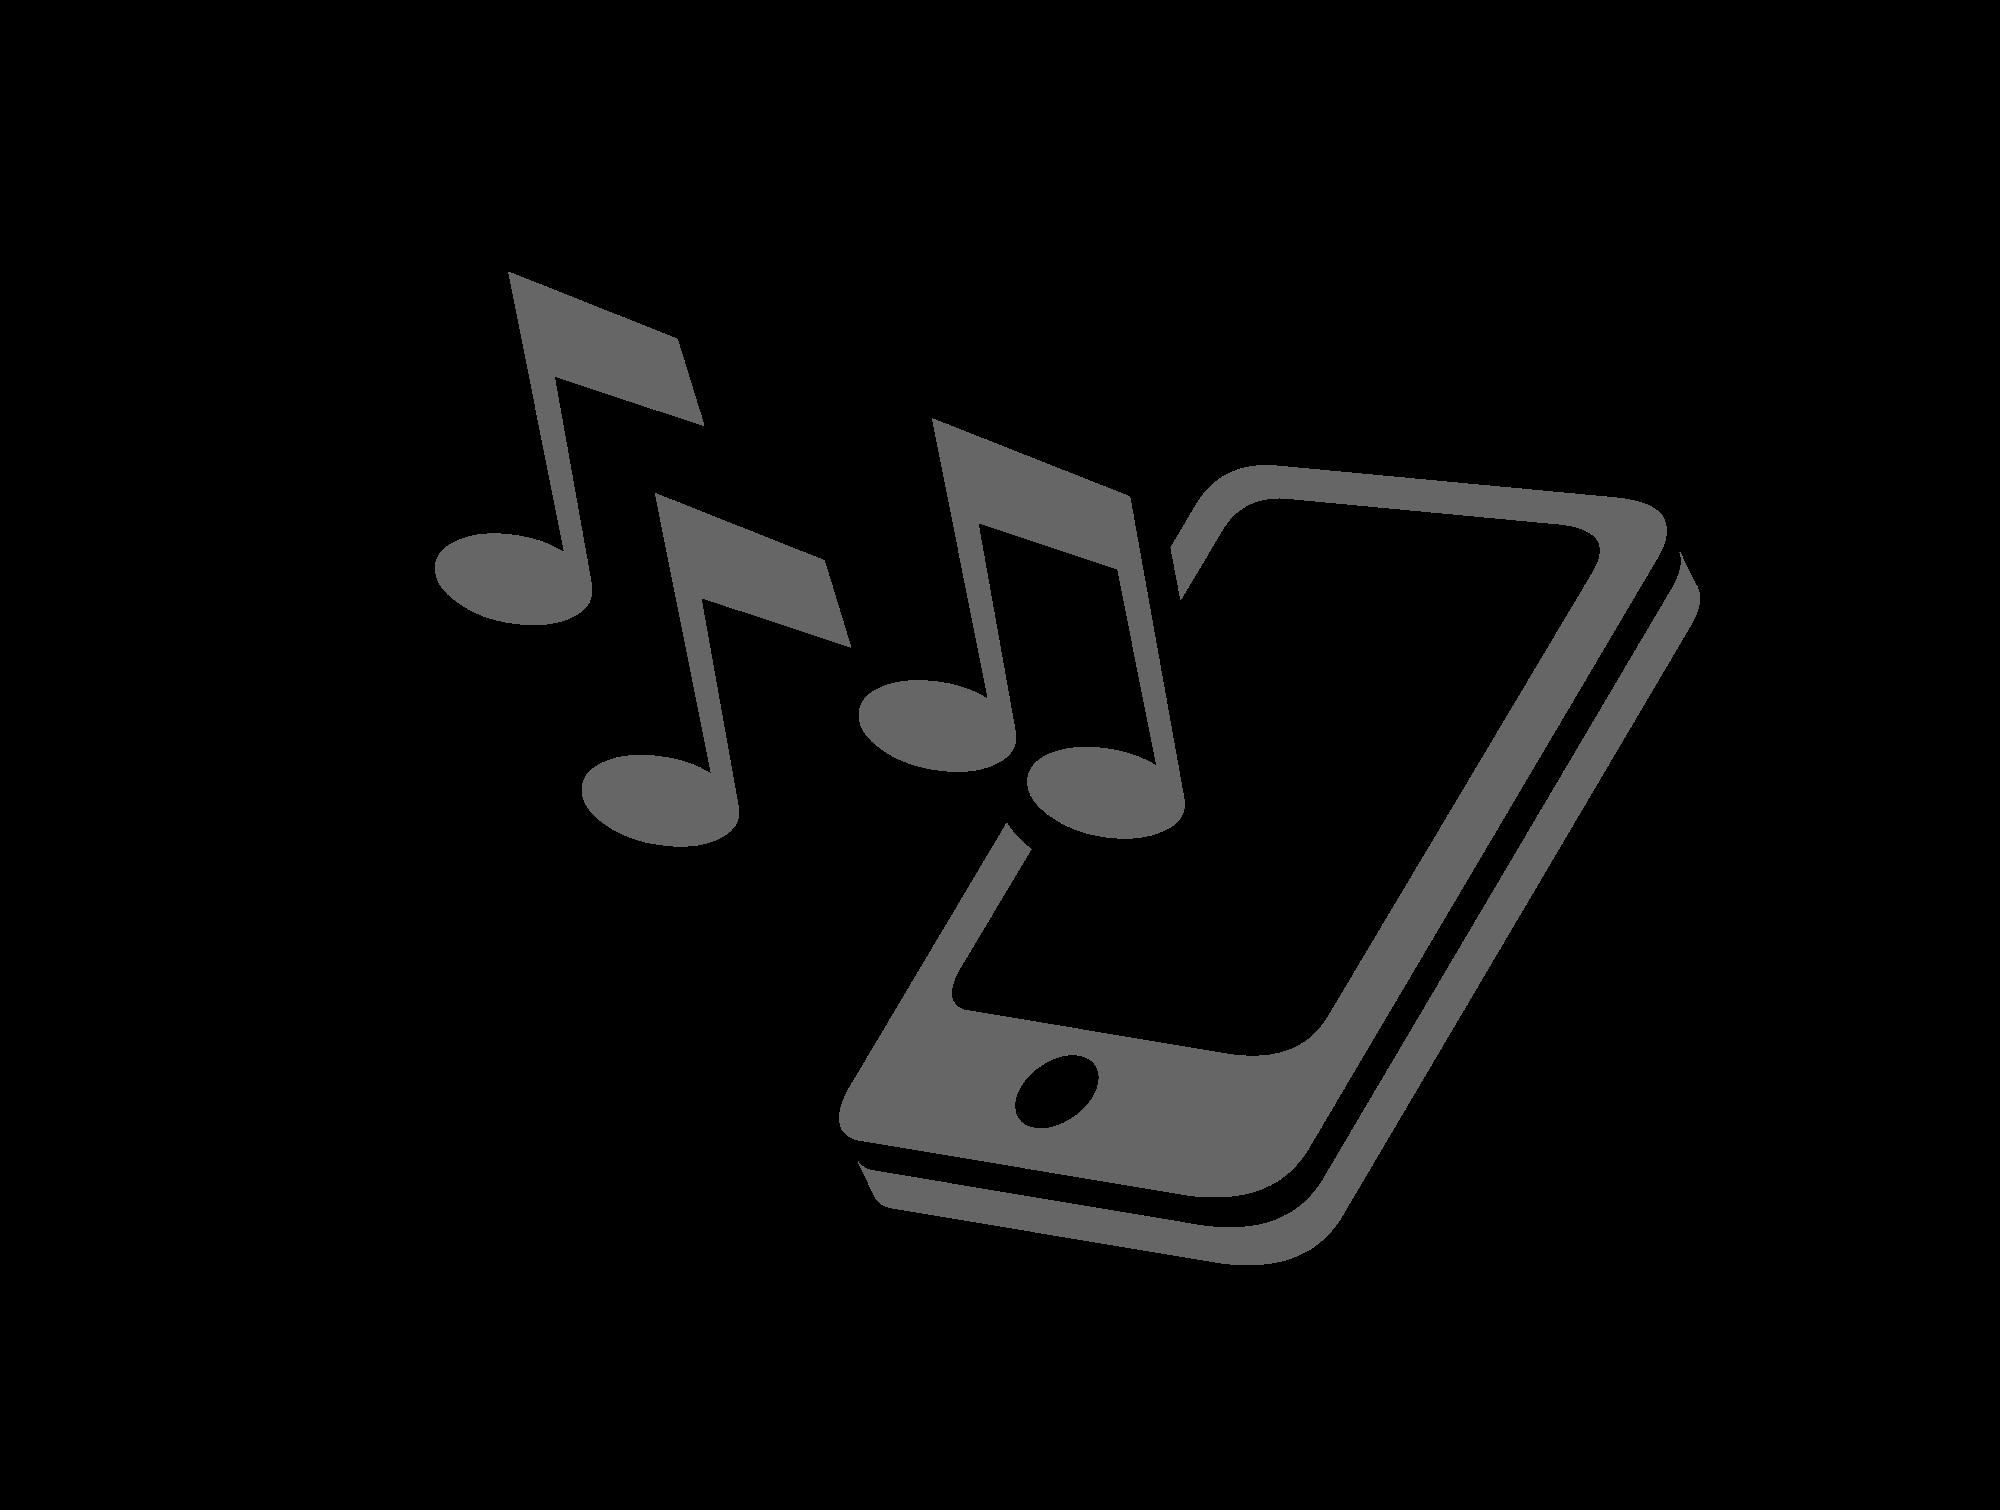 Clipart telephone phone ring. File ringtone symbol svg